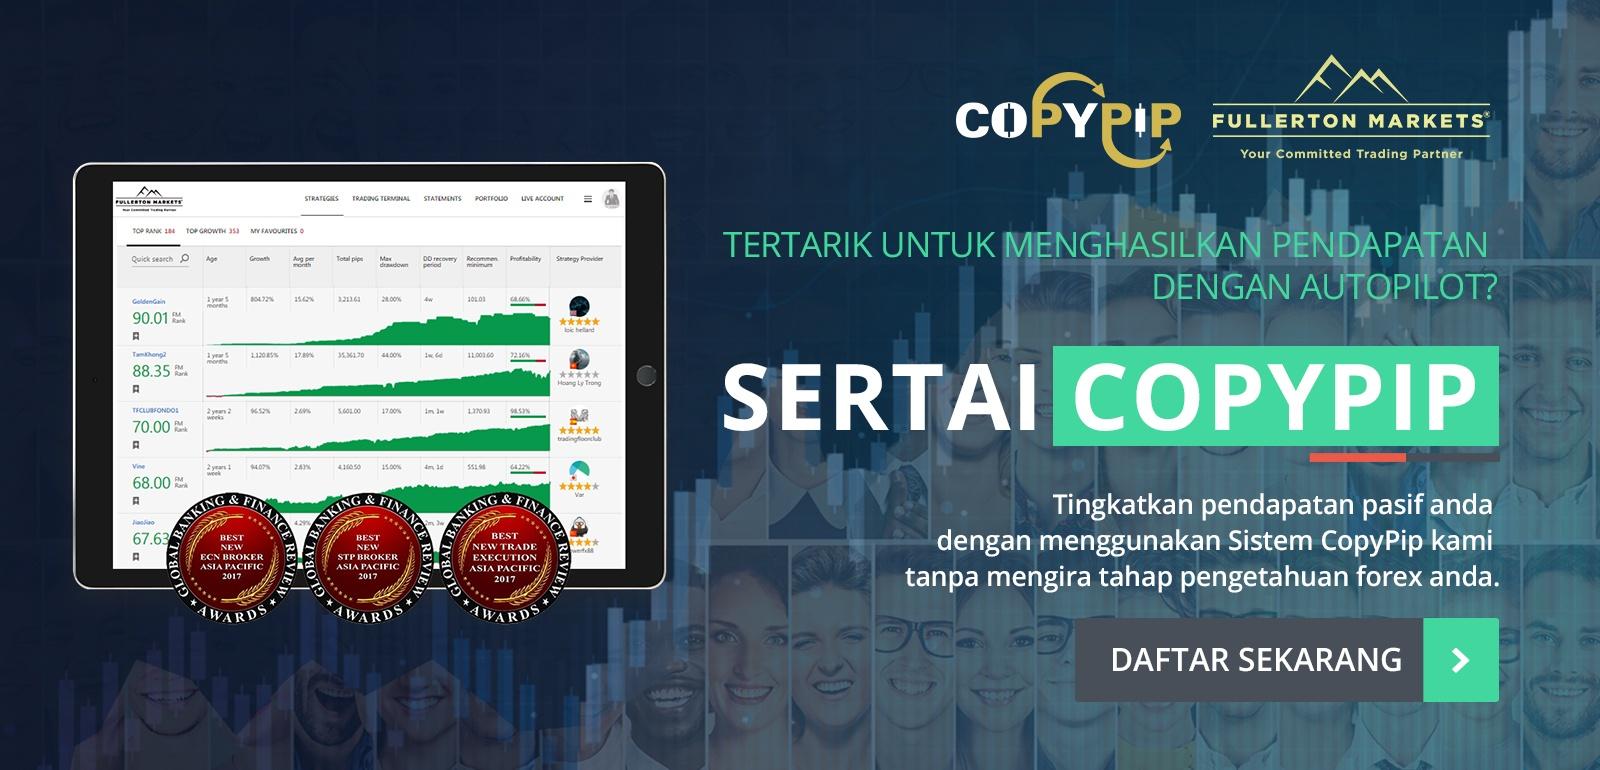 CopyPip